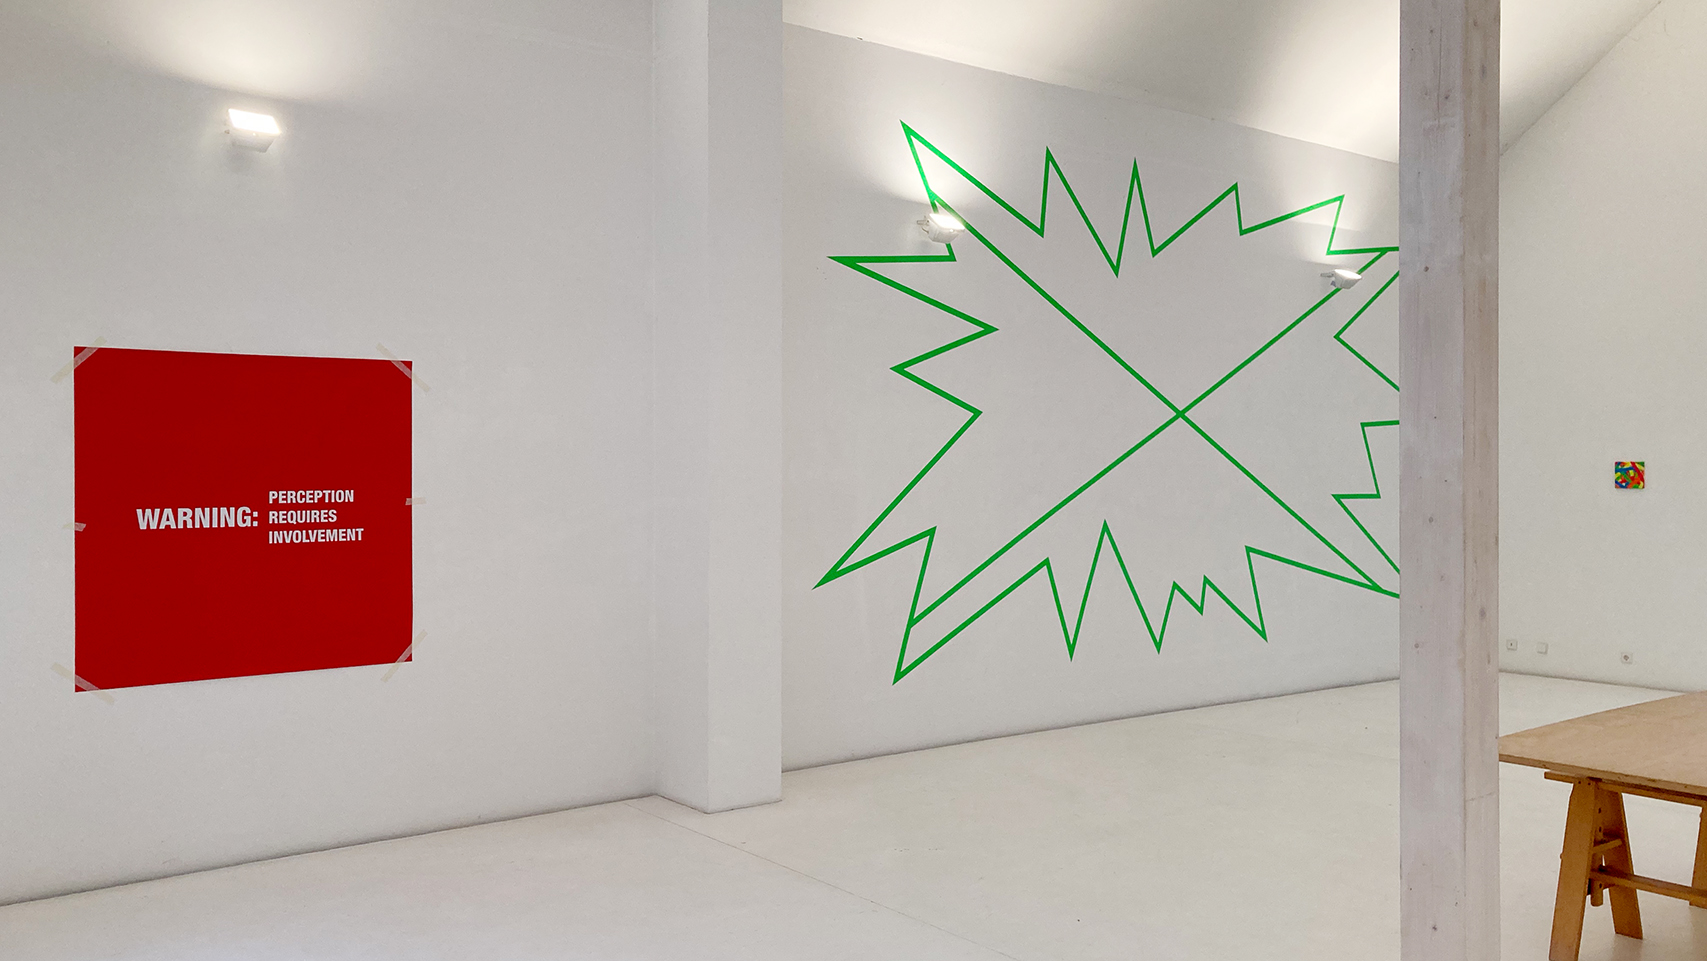 Exhibition view Antoni Muntadas 2002 &  Daniel Schörnig 2020